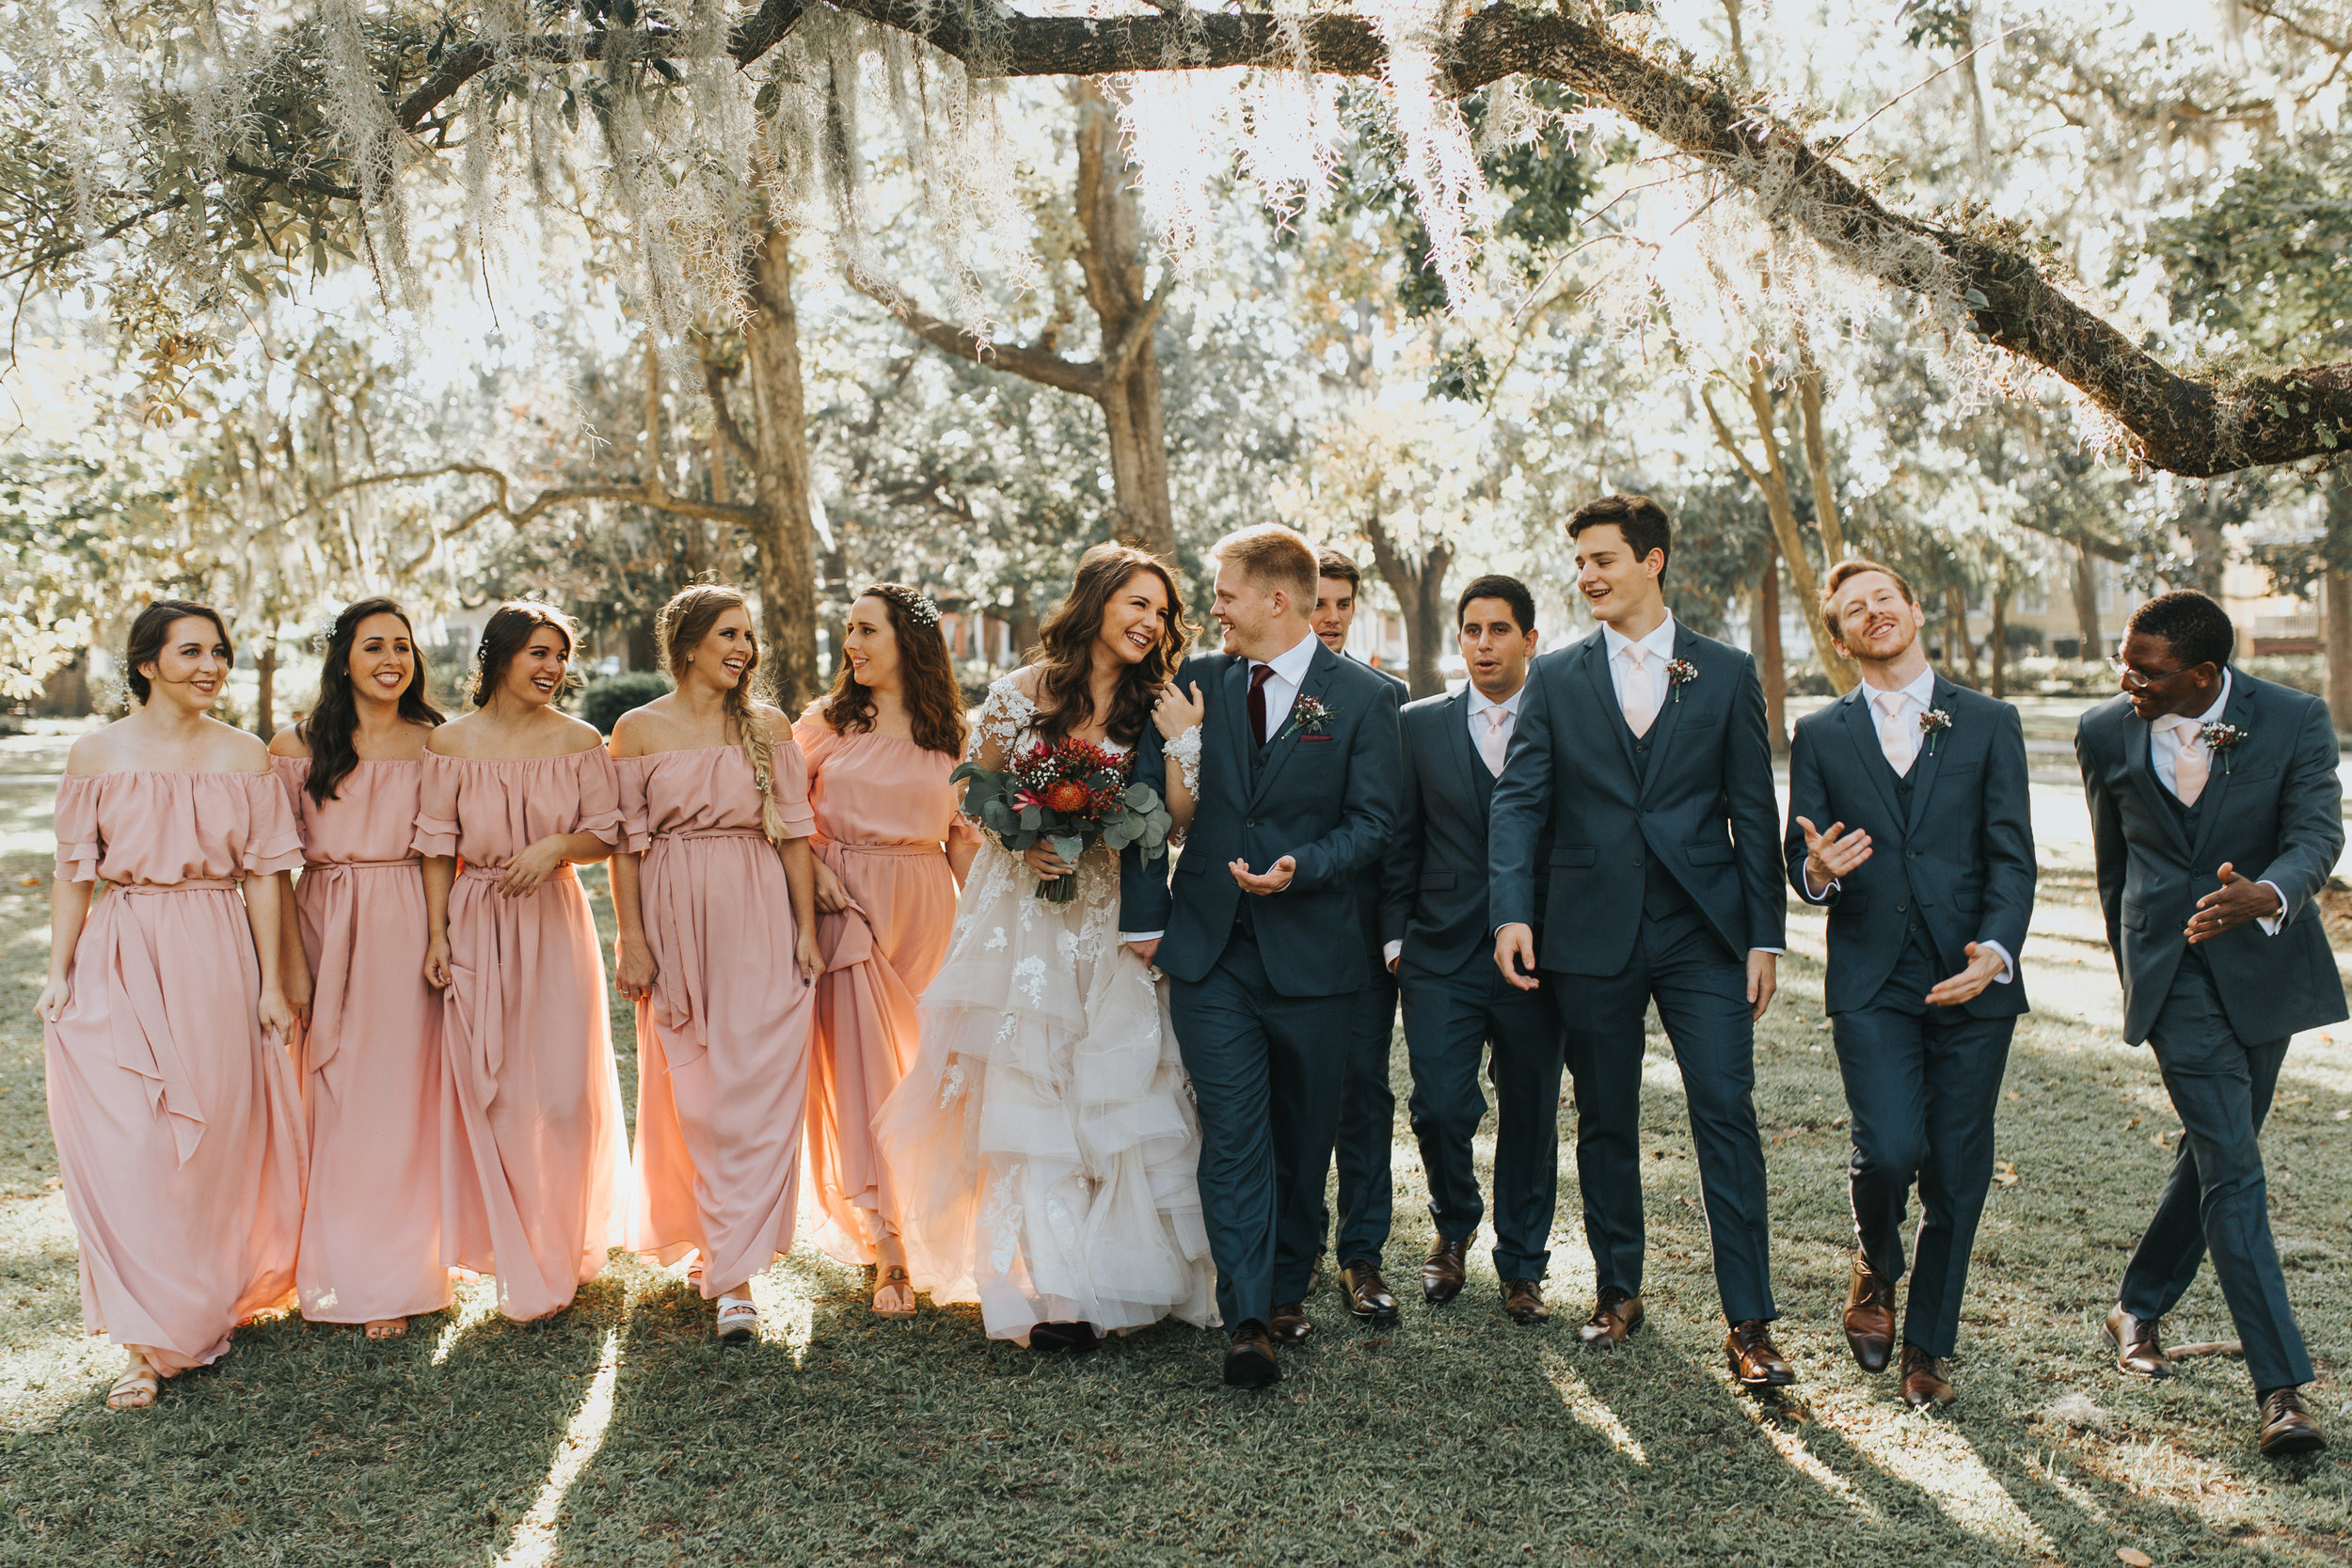 Richmond wedding photographer, Virginia wedding photographer, Destination wedding photographer, Savannah Georgia wedding photographer, Charlottesville wedding photographer, 485.JPG